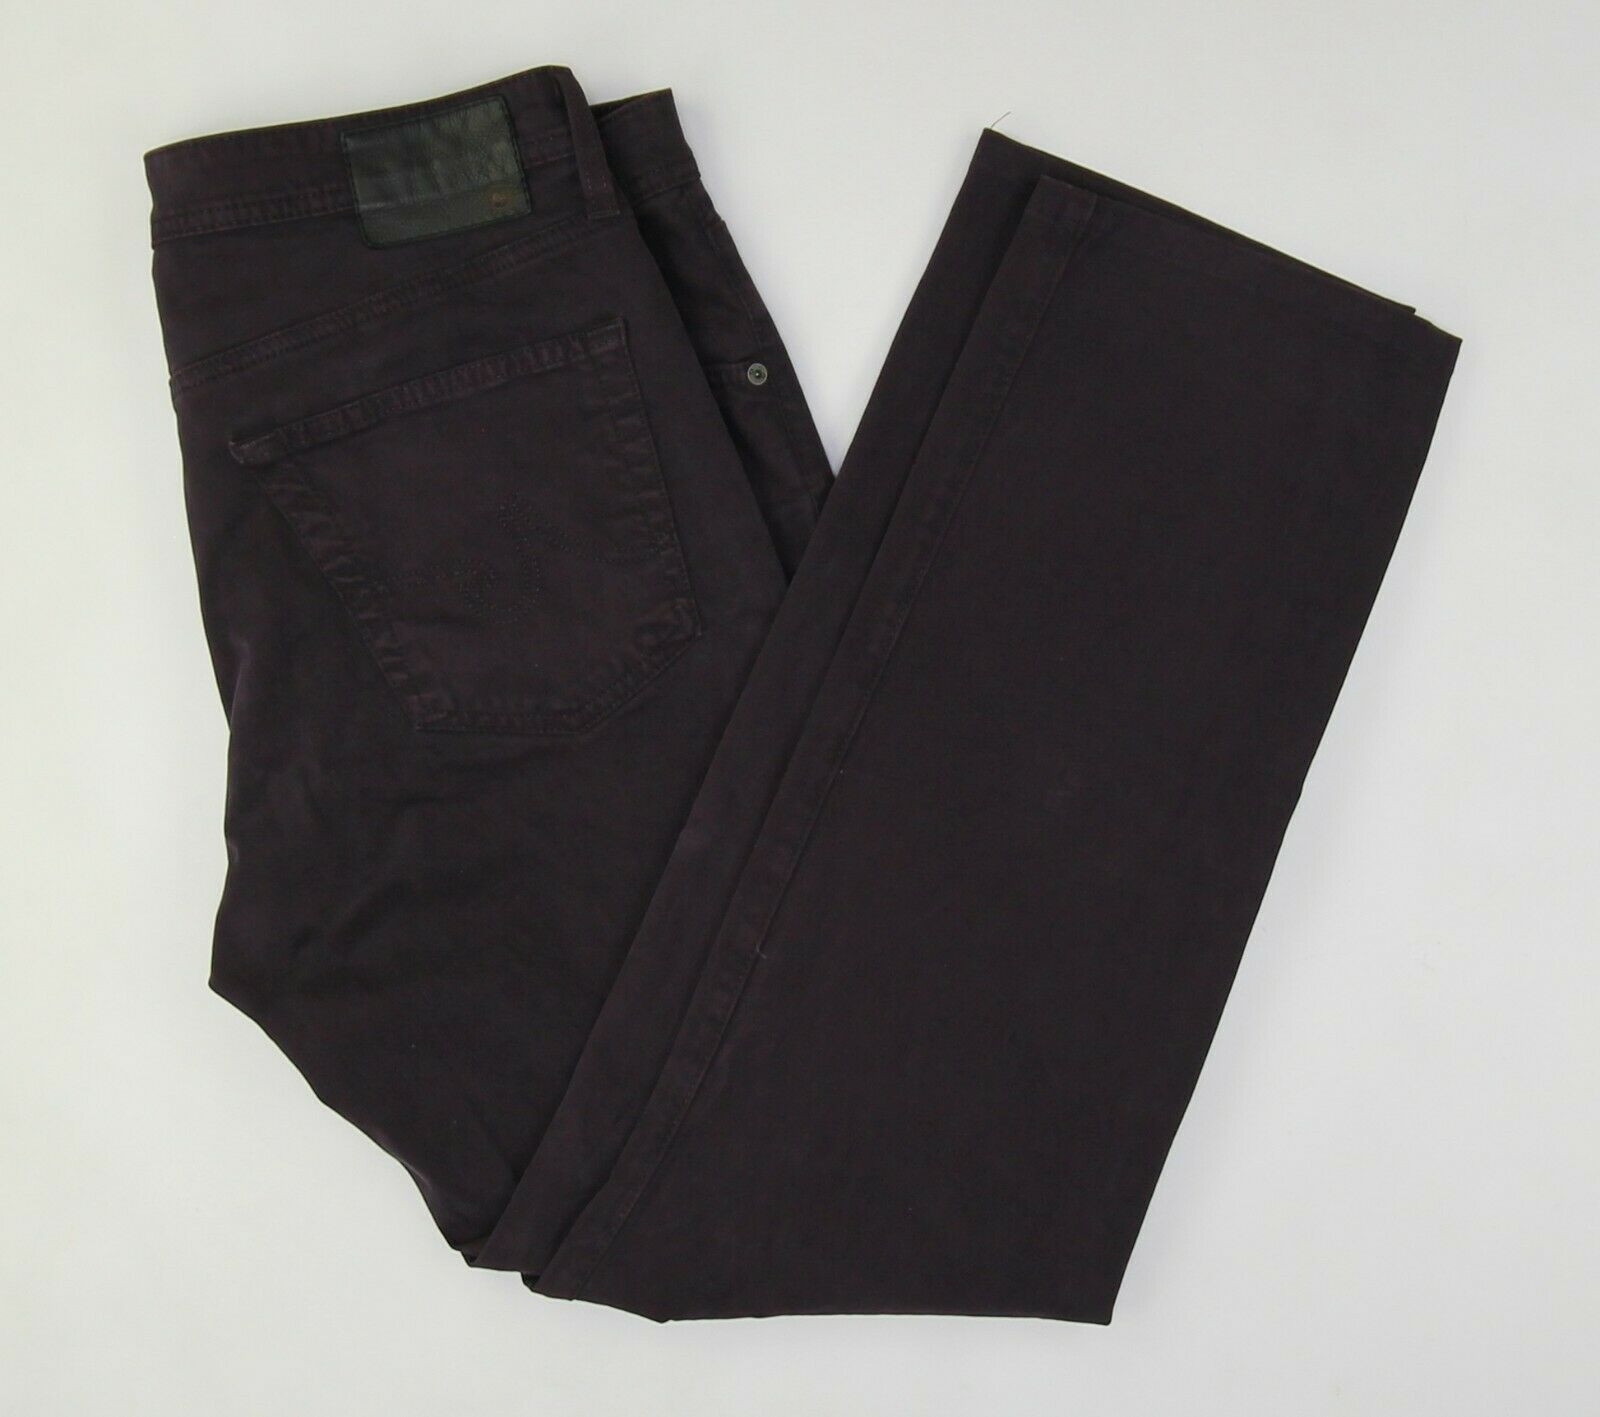 Adriano goldschmied The Graduate men's tailored leg jean pants 34 x 32